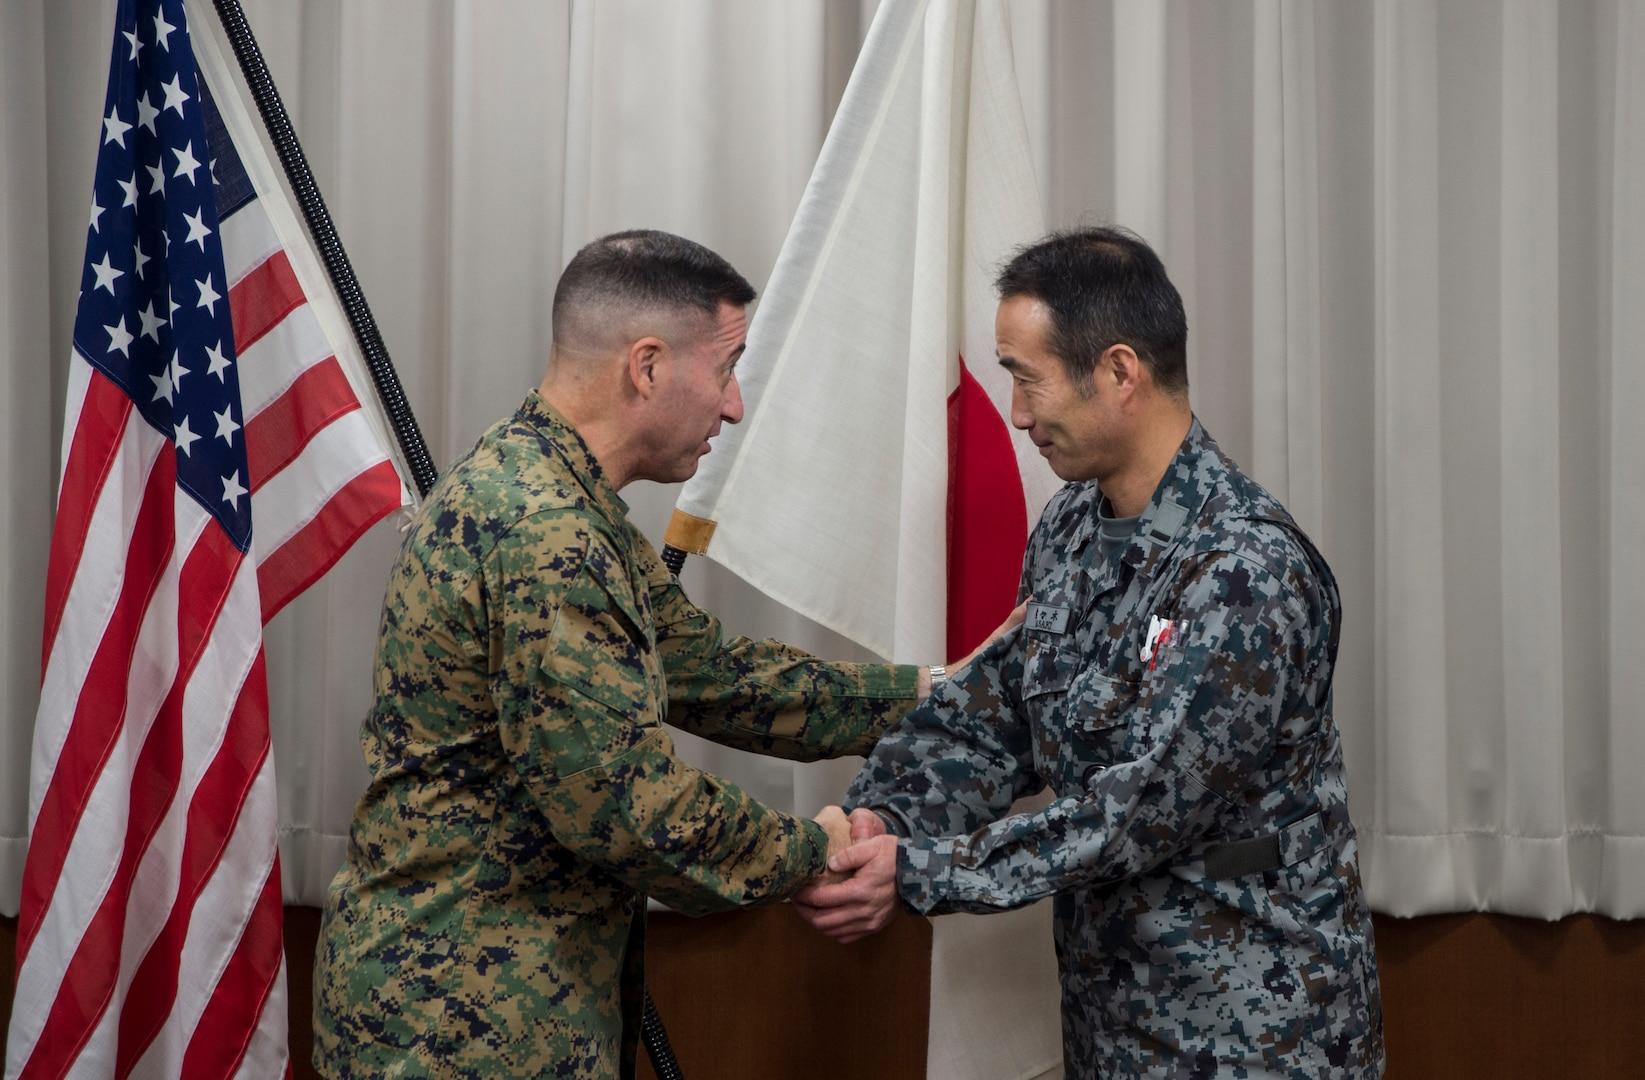 Pacific Command senior enlisted leader visits Misawa, emphasizes warfighter mindset